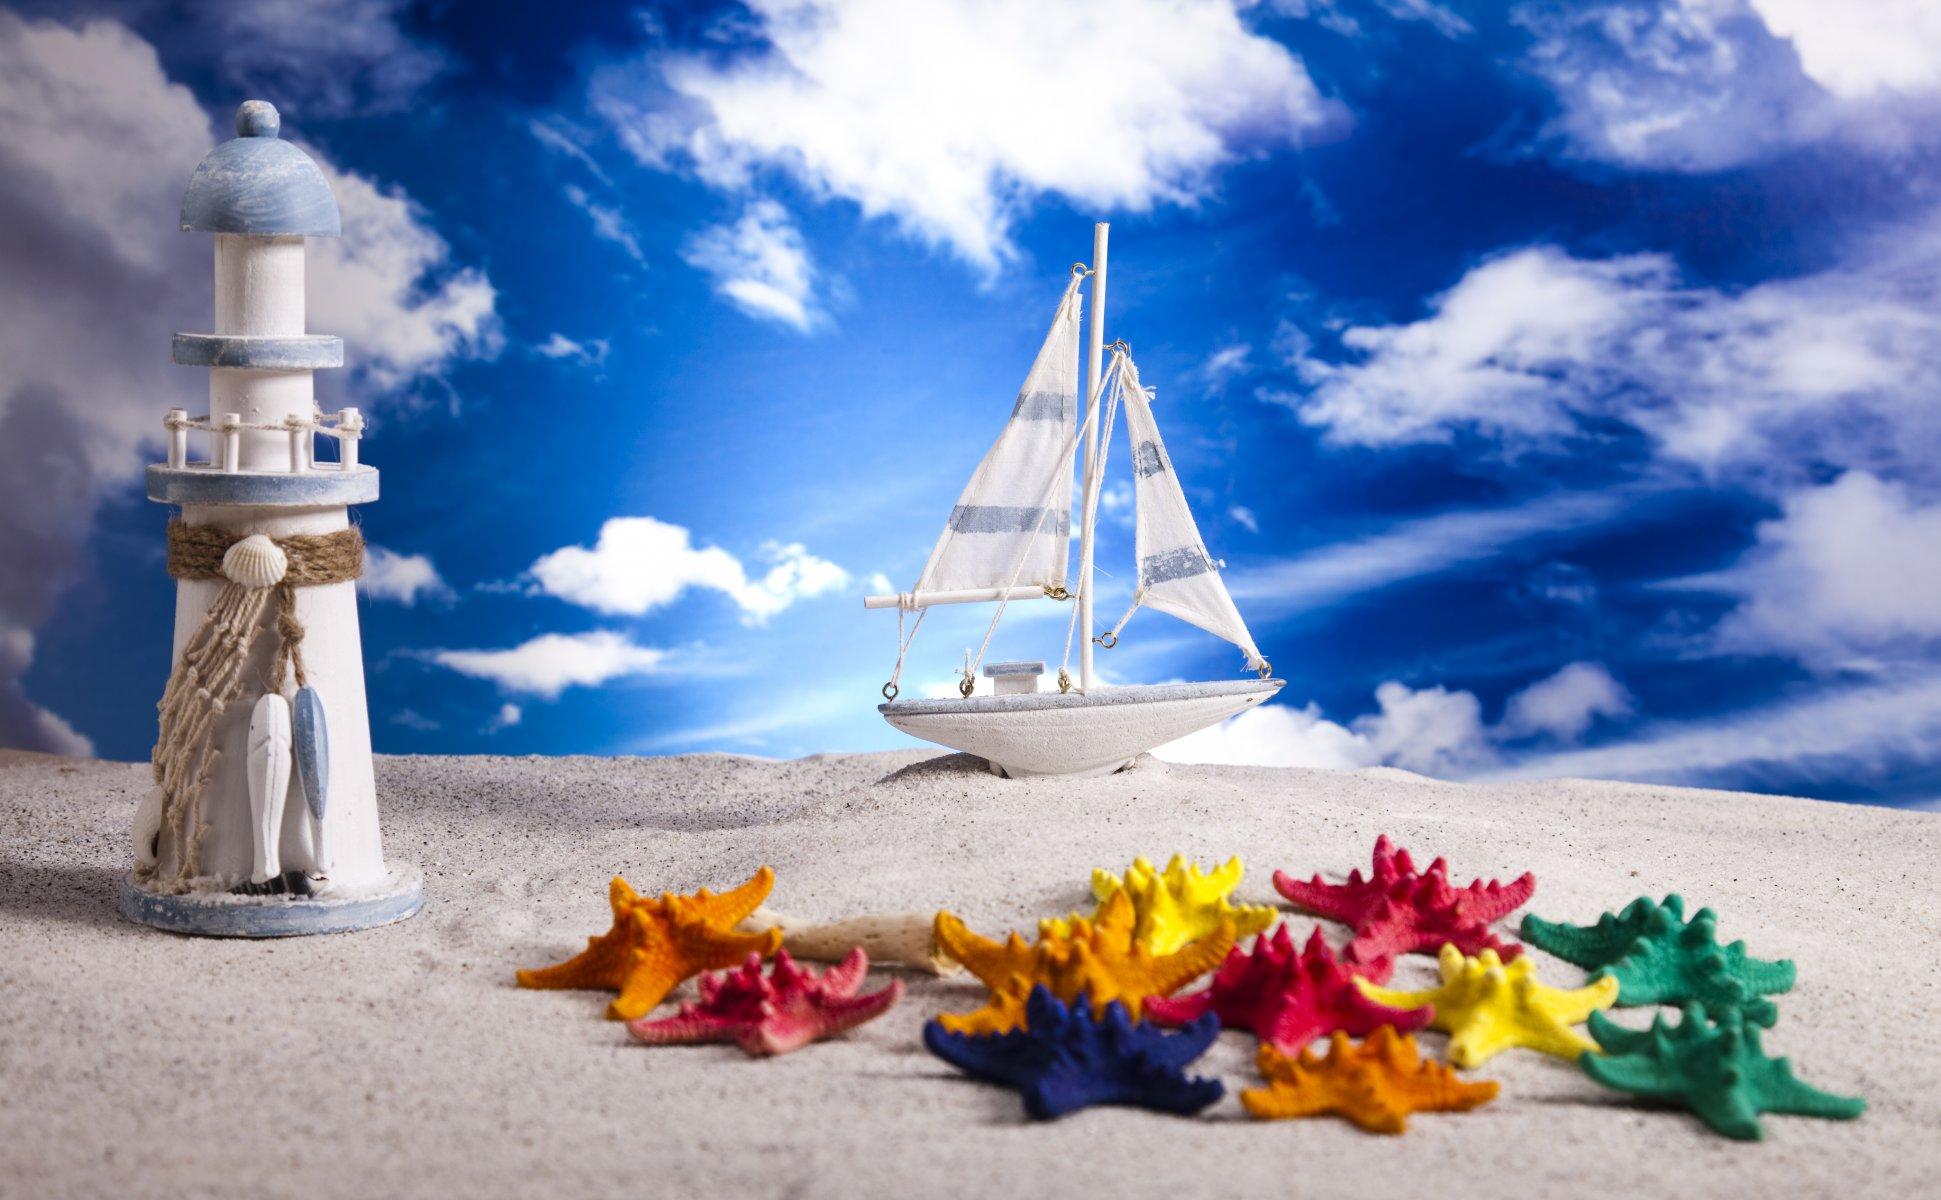 Свидания детский, открытка море небо